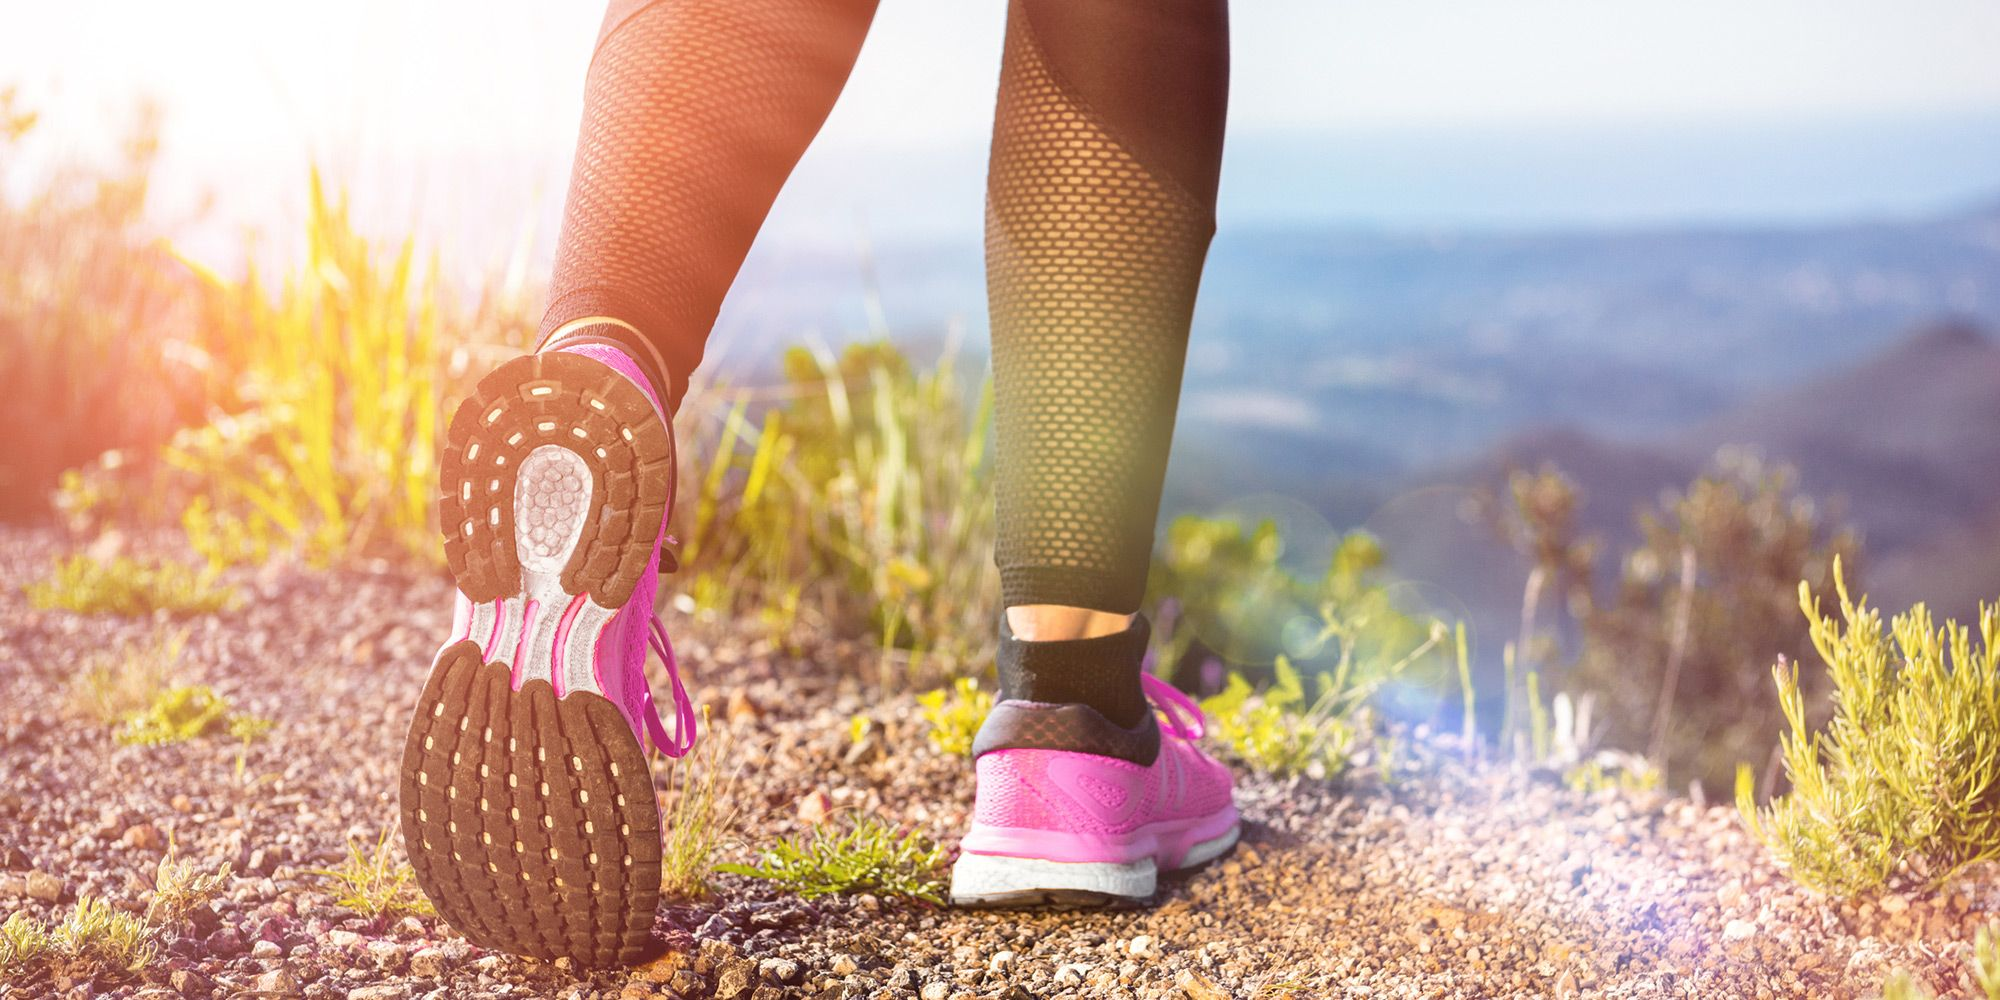 exercise, running, work out, fitness, healt